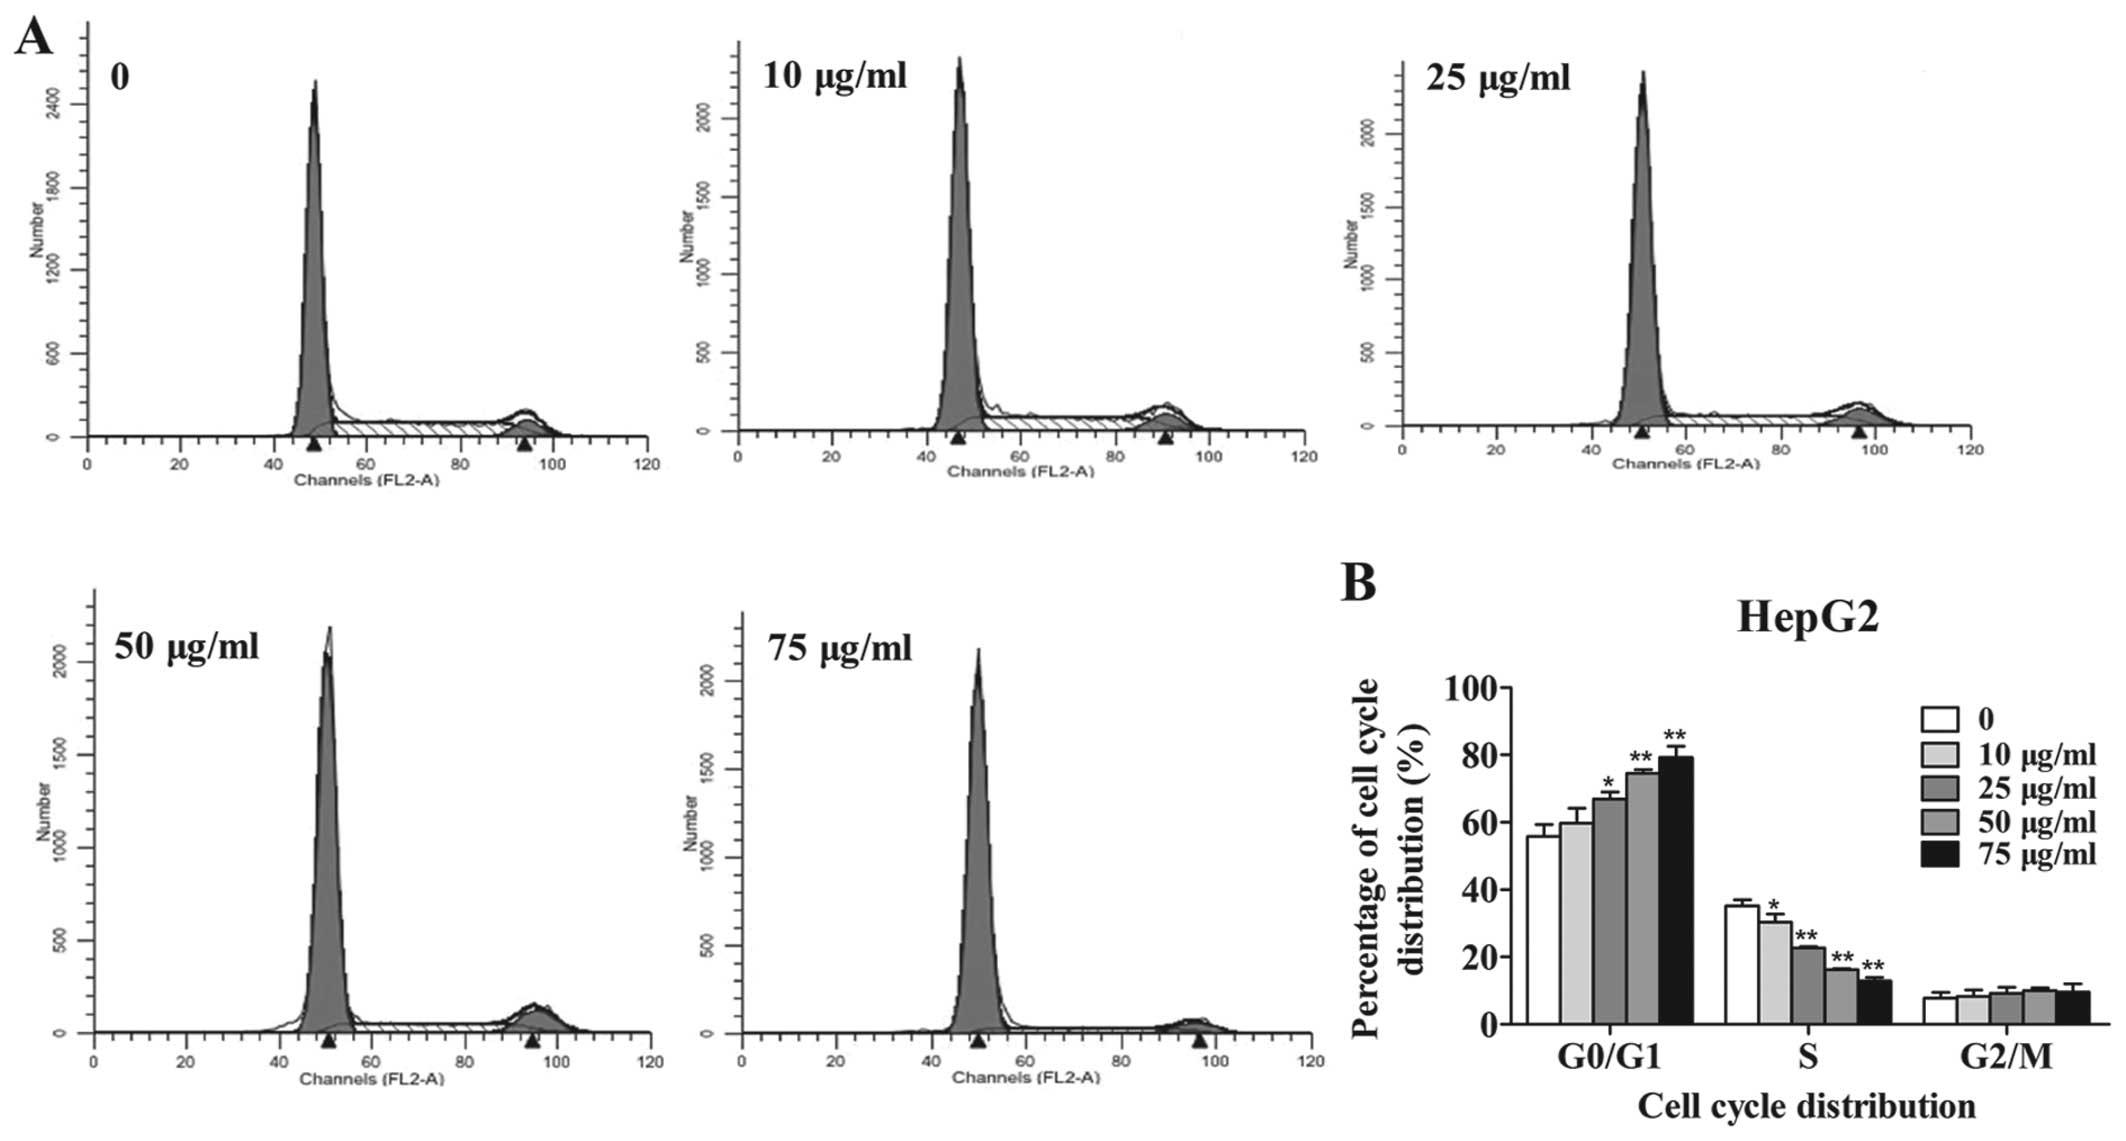 cytoxan secondary malignancies